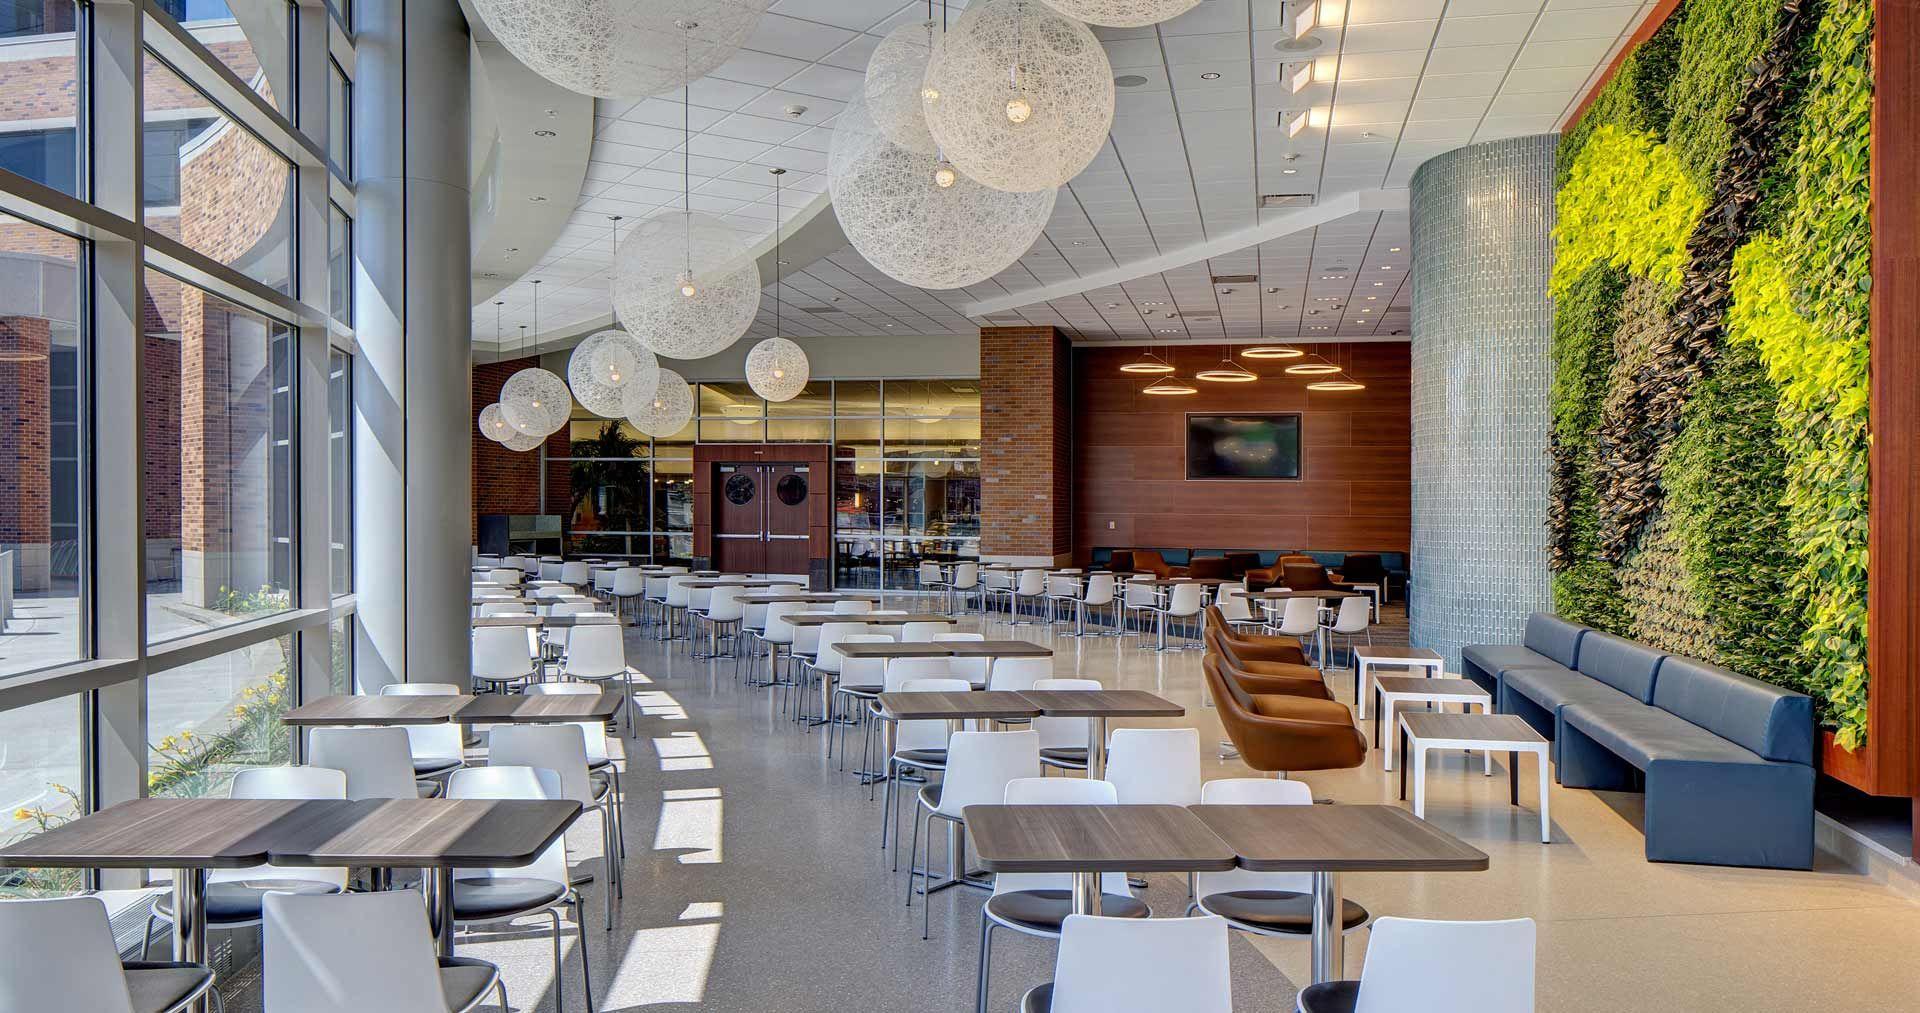 Sparrow Hospital With Images Cafeteria Design Hospital